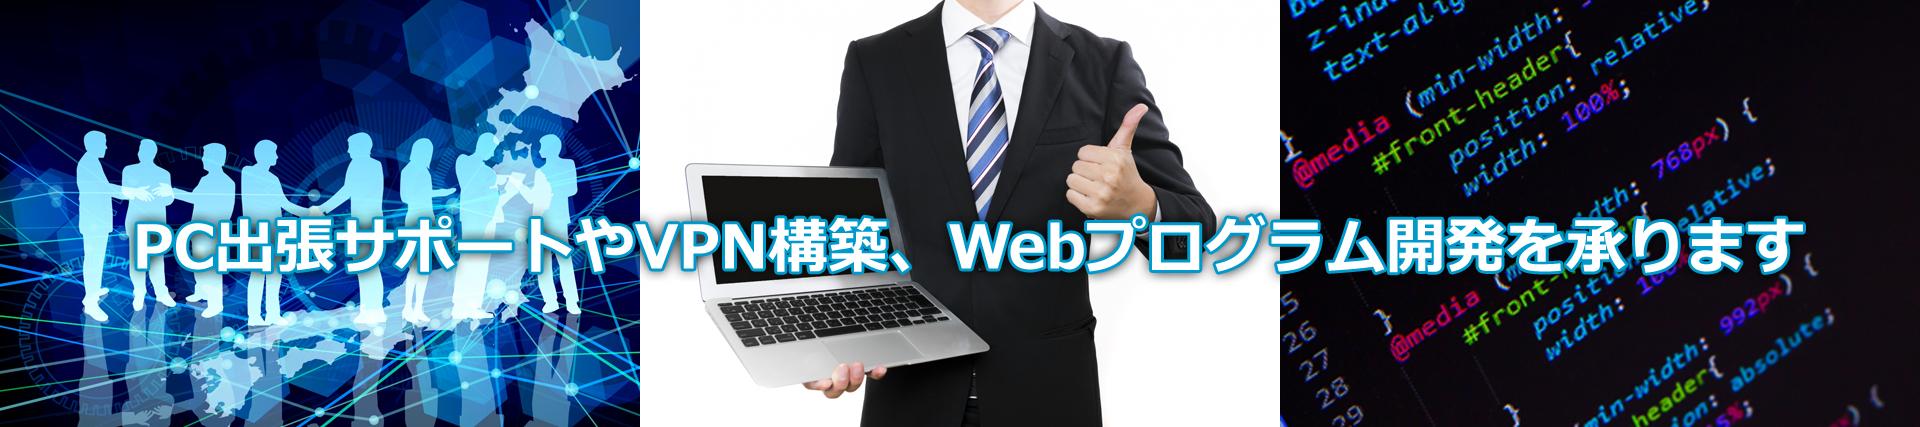 PC出張サポートやVPN構築、Webプログラム開発を承ります